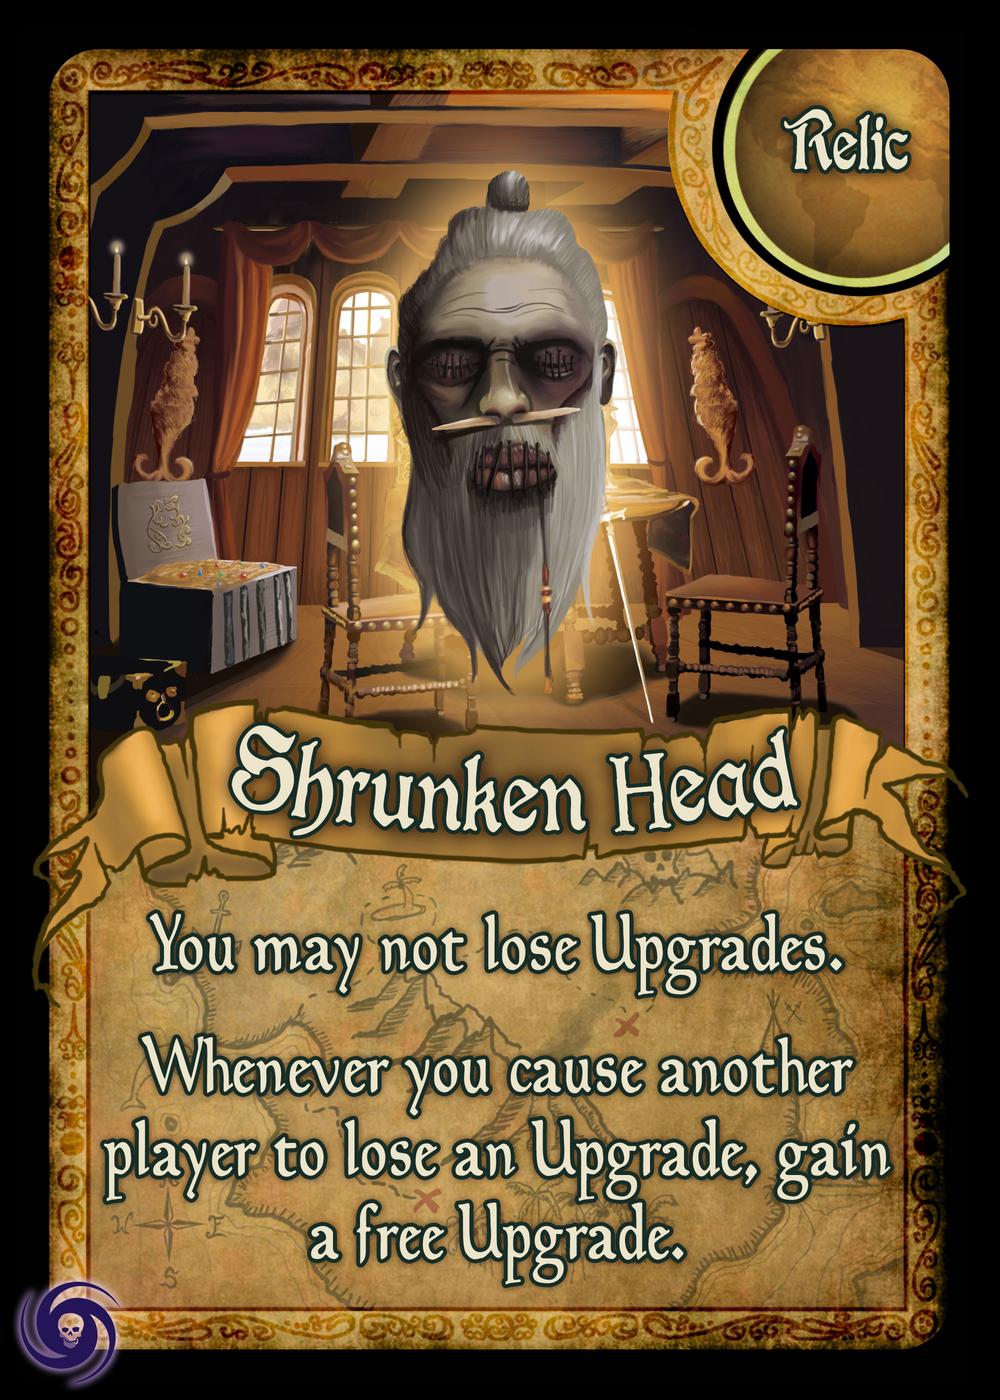 shrunken-head.jpg